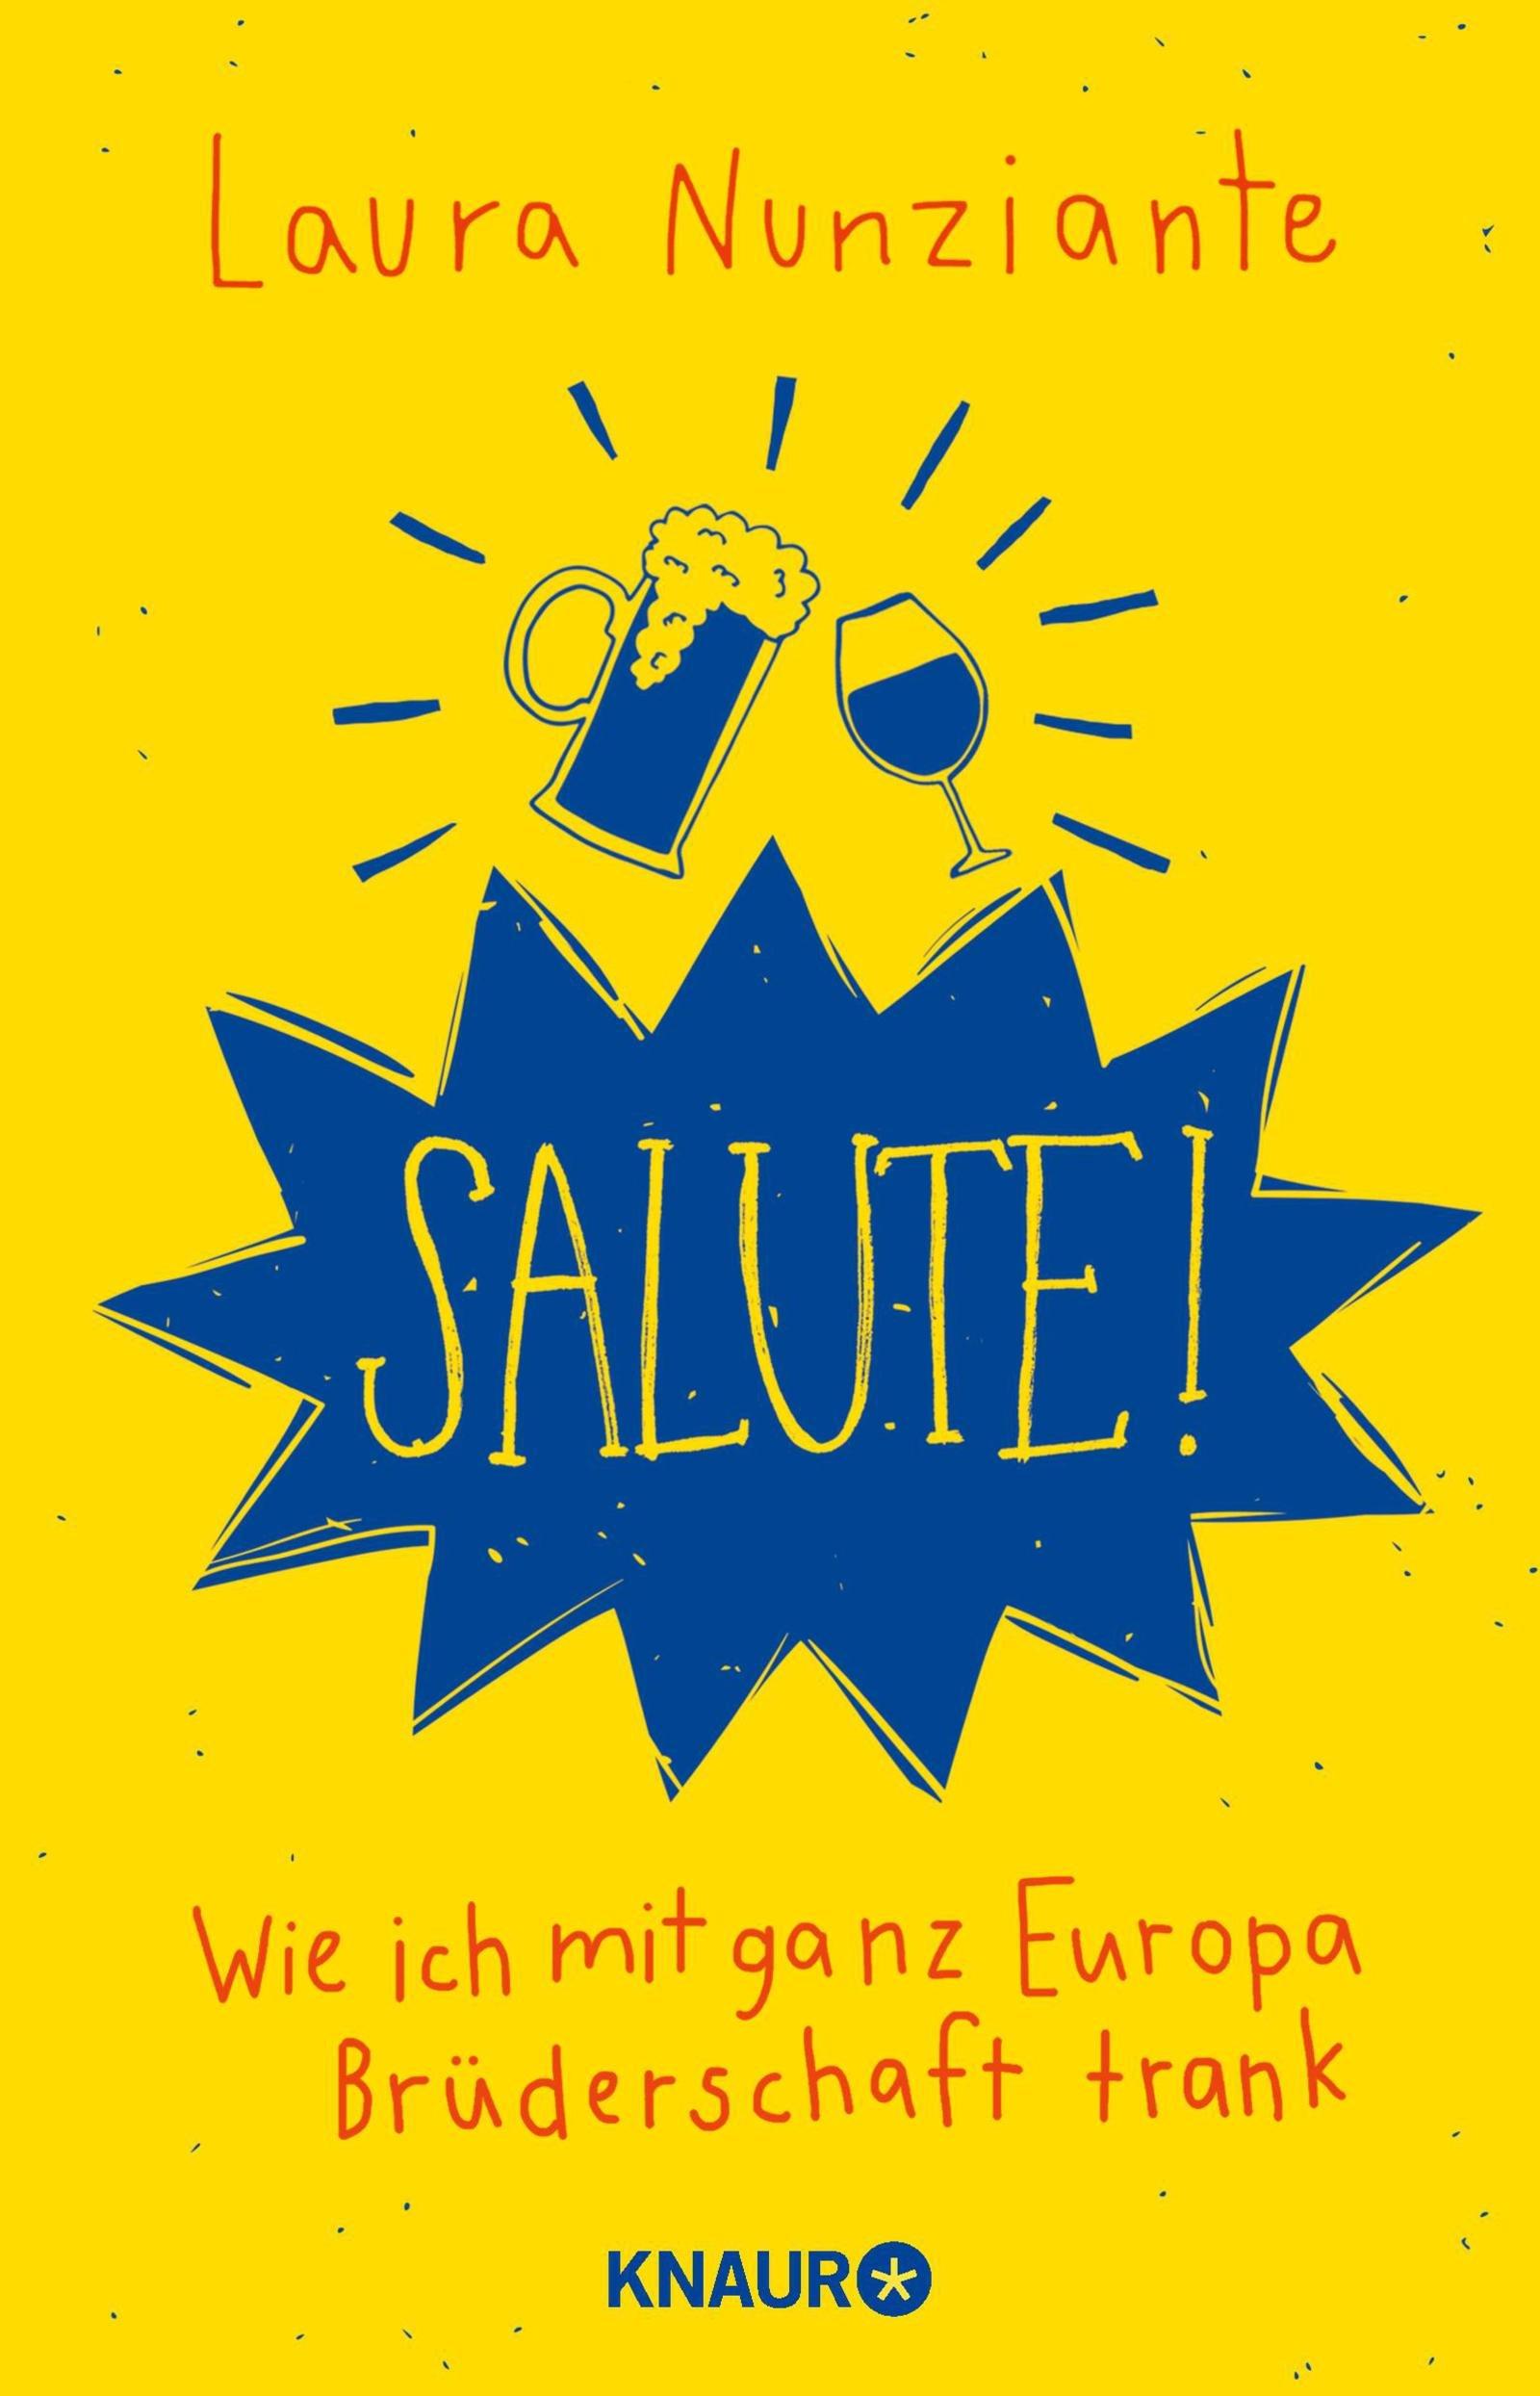 Salute!: Wie ich mit ganz Europa Brüderschaft trank Broschiert – 1. Juni 2018 Laura Nunziante Knaur TB 3426789345 Reiseberichte / Europa